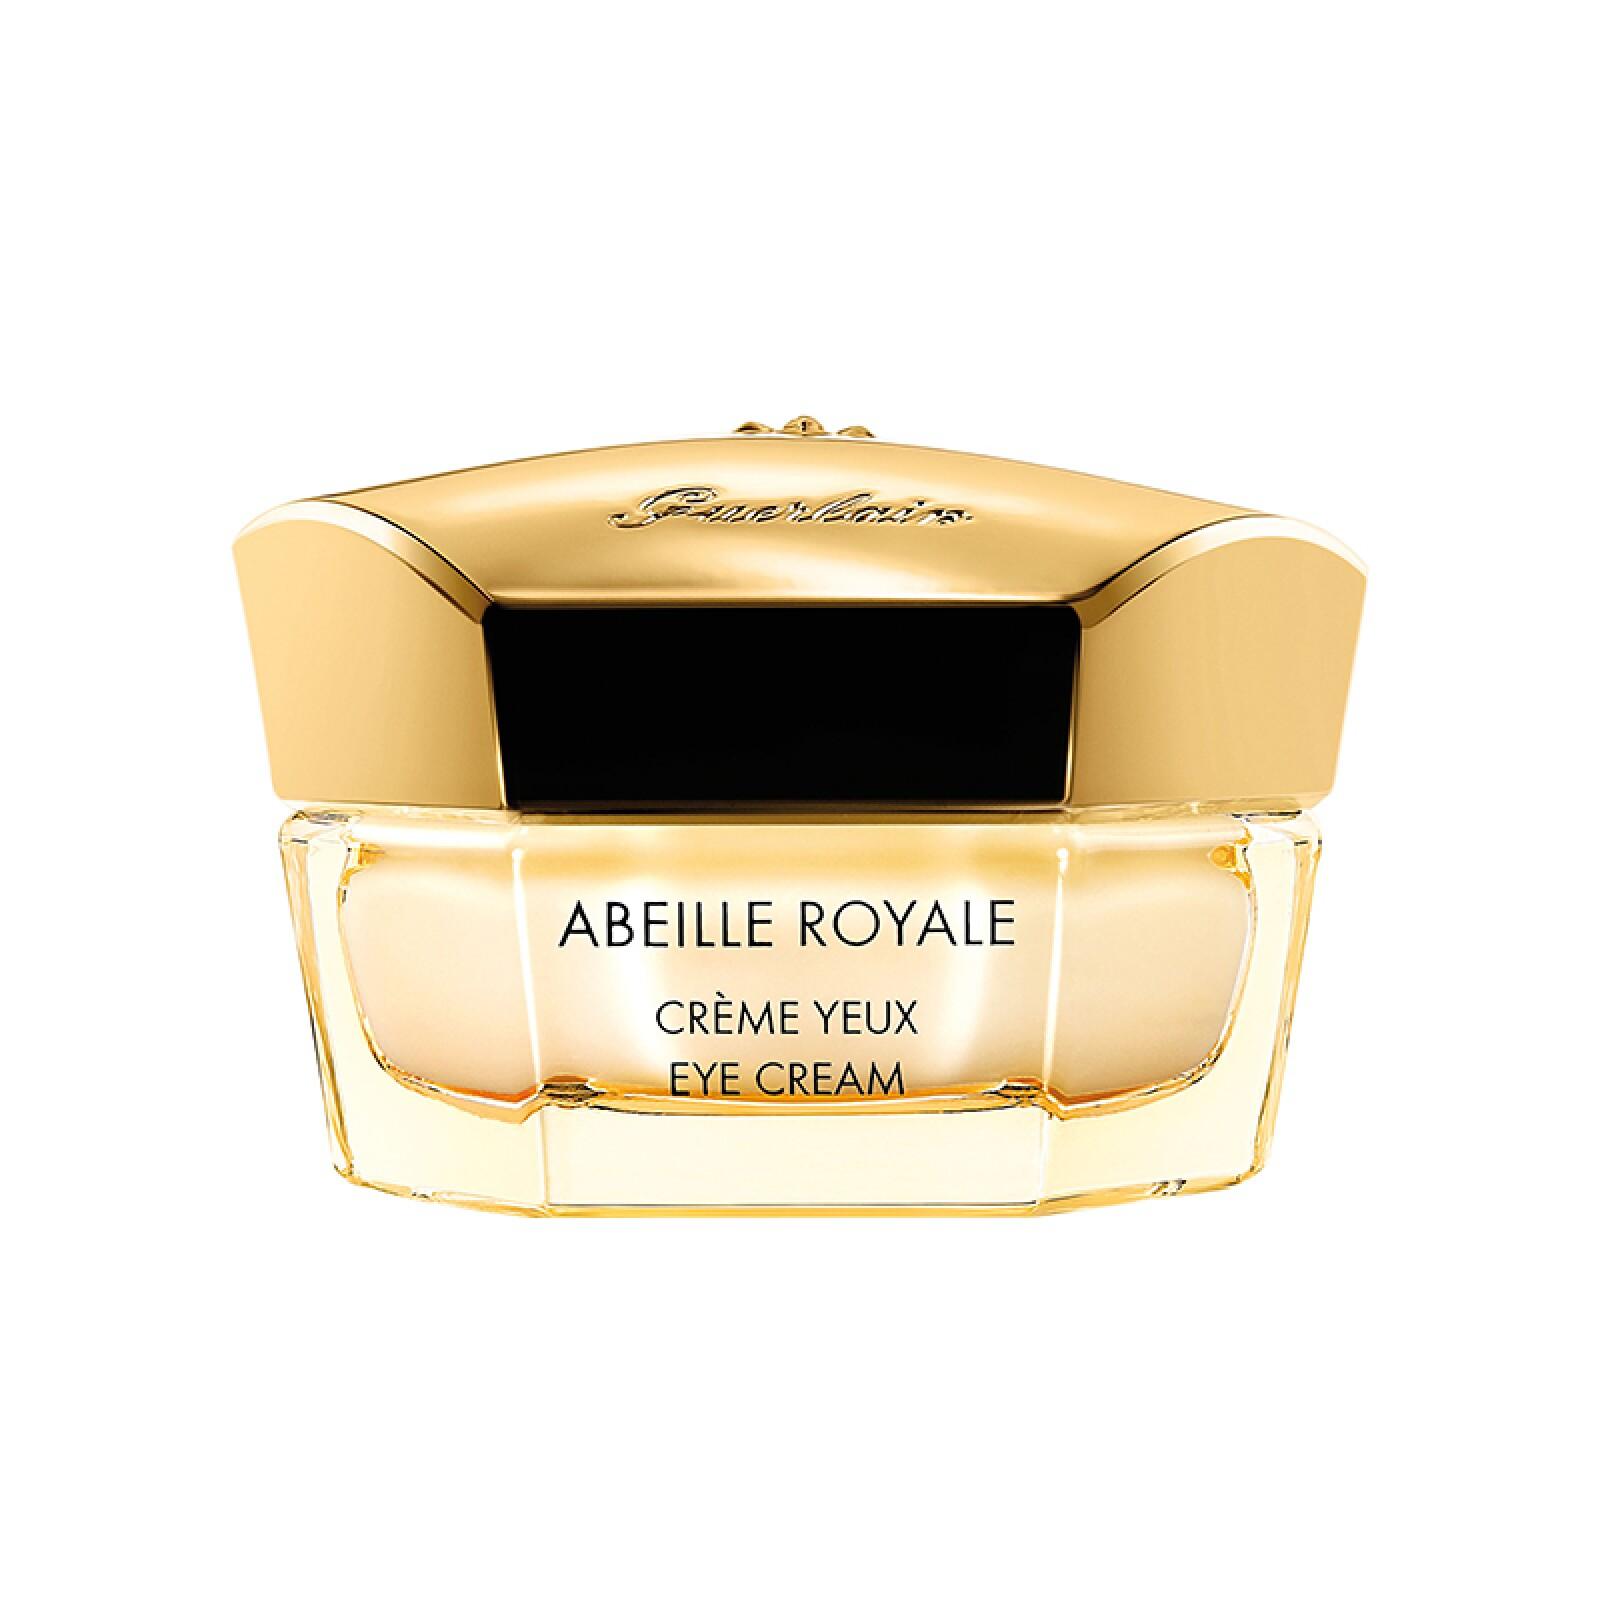 Guerlain-Abeille-Royale-Eye-Cream.jpg